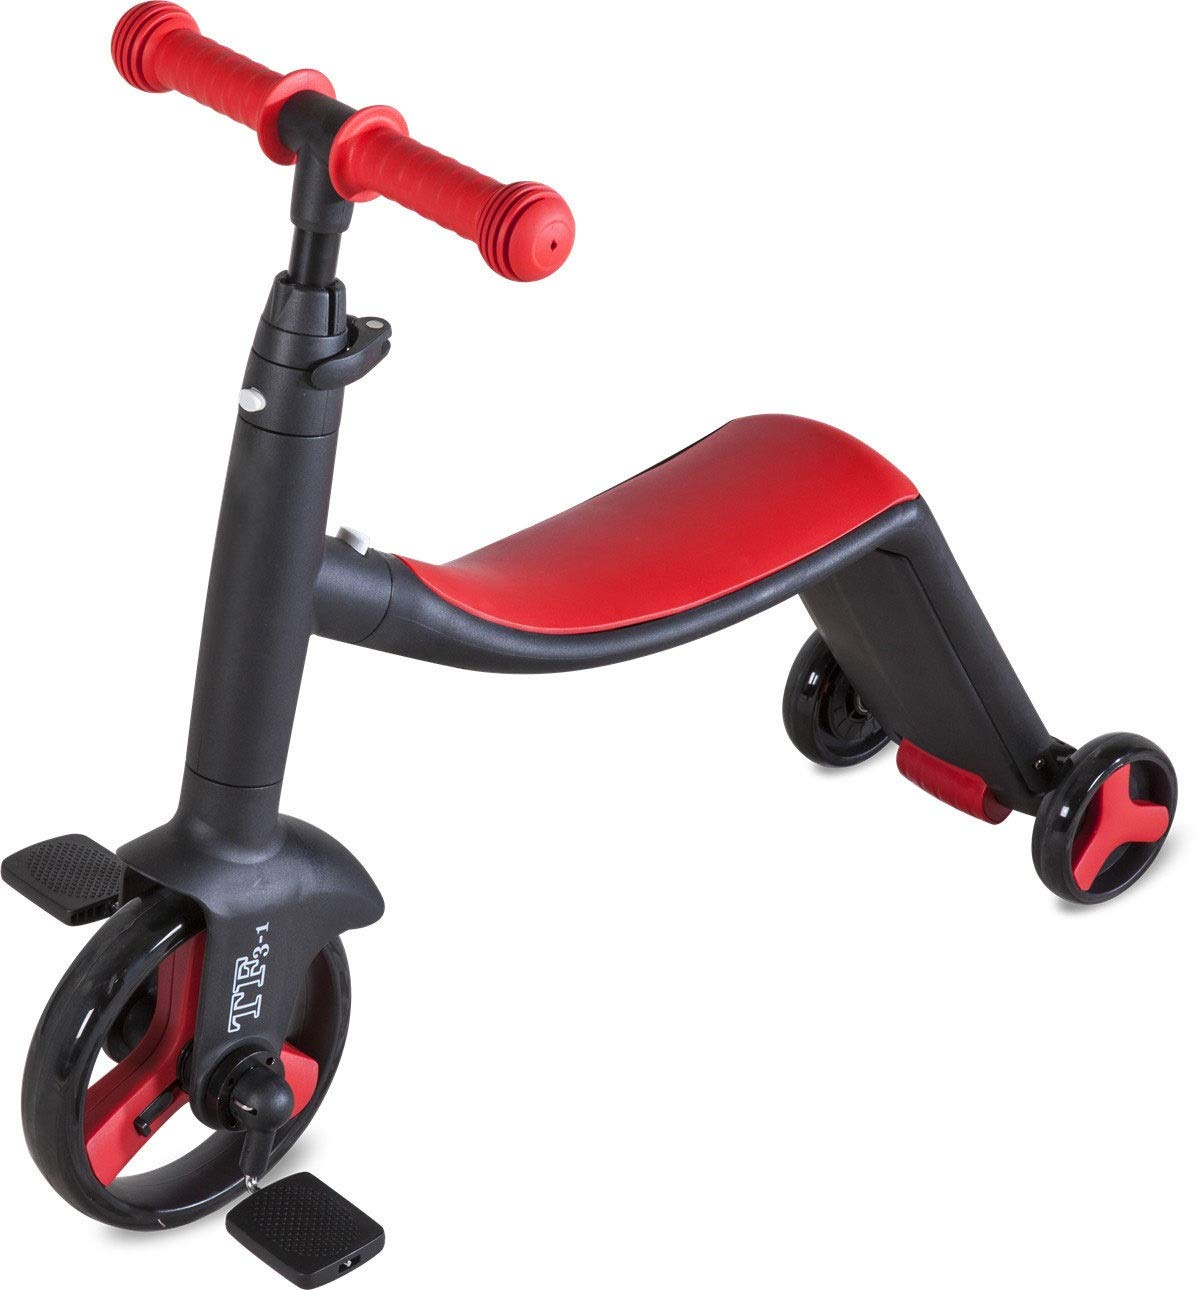 Runplayer 子供用三輪車 : B07R288CZ9、多機能三輪車、高さ調整可能、子供用ギフトに最適 ( Runplayer Color : Red ) B07R288CZ9, ブーツとスニーカー Face to Face:728c2e73 --- spb.windocs.ru